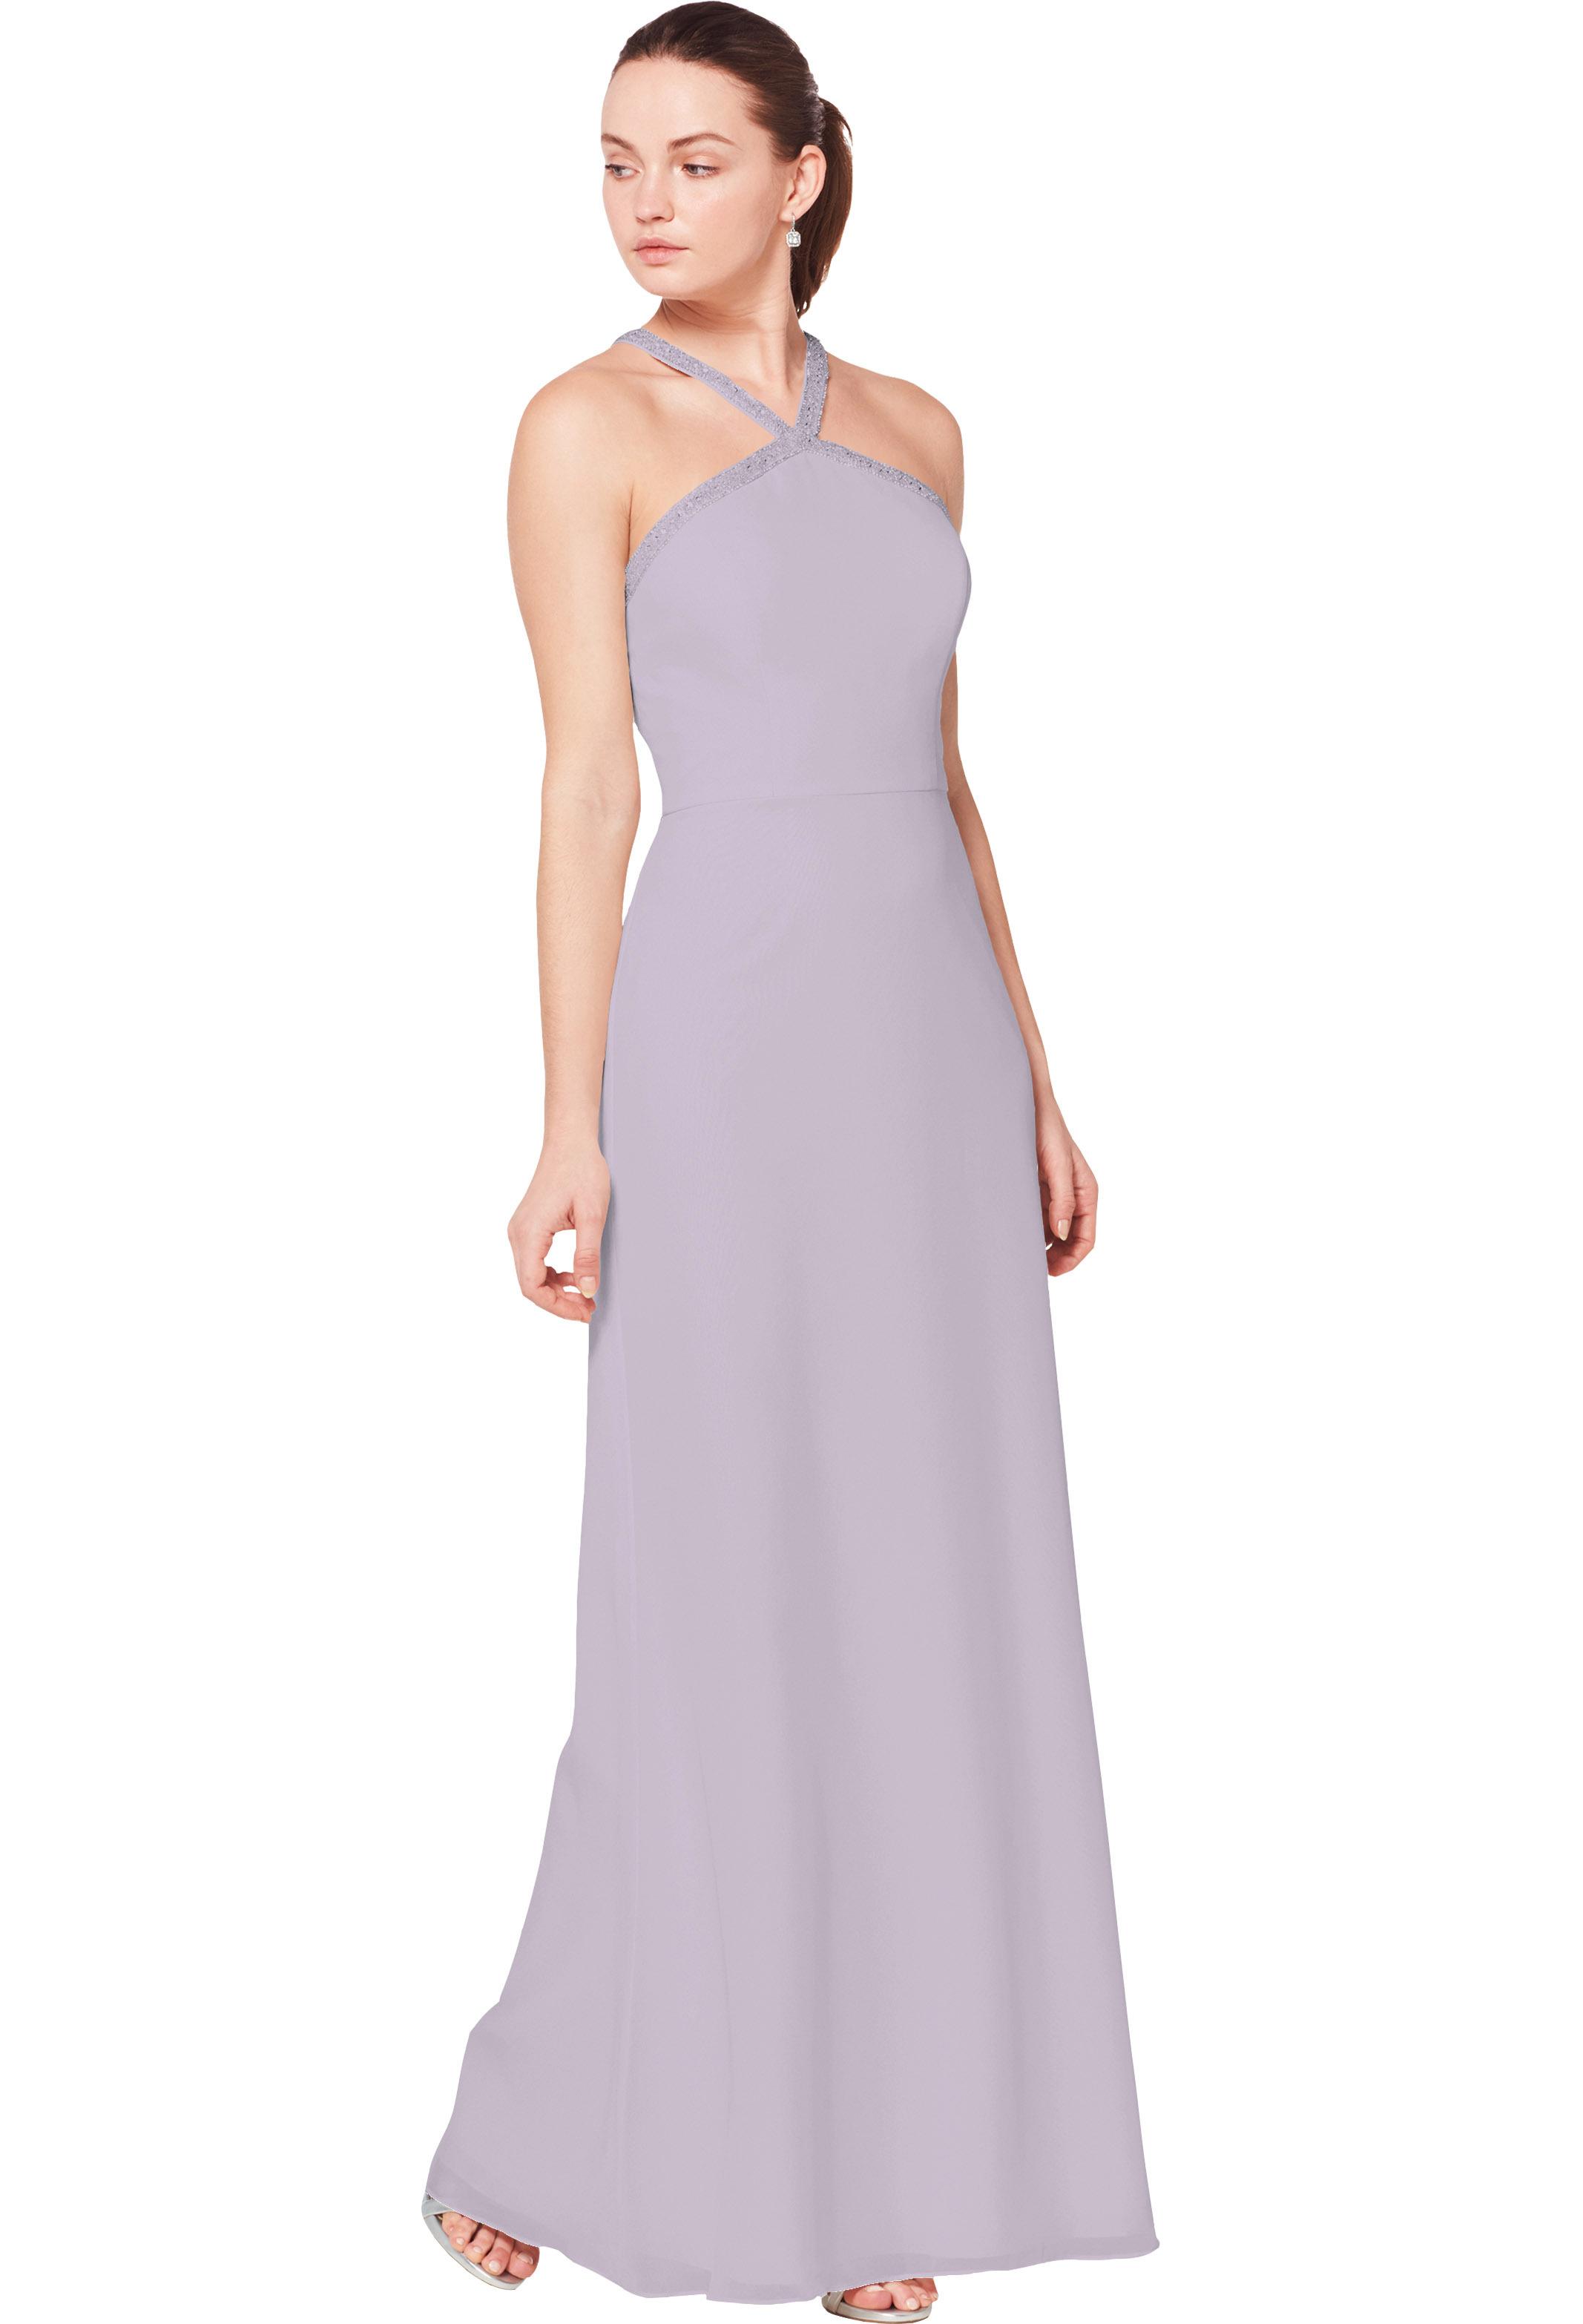 Bill Levkoff VIOLET Chiffon Halter A-line gown, $220.00 Front